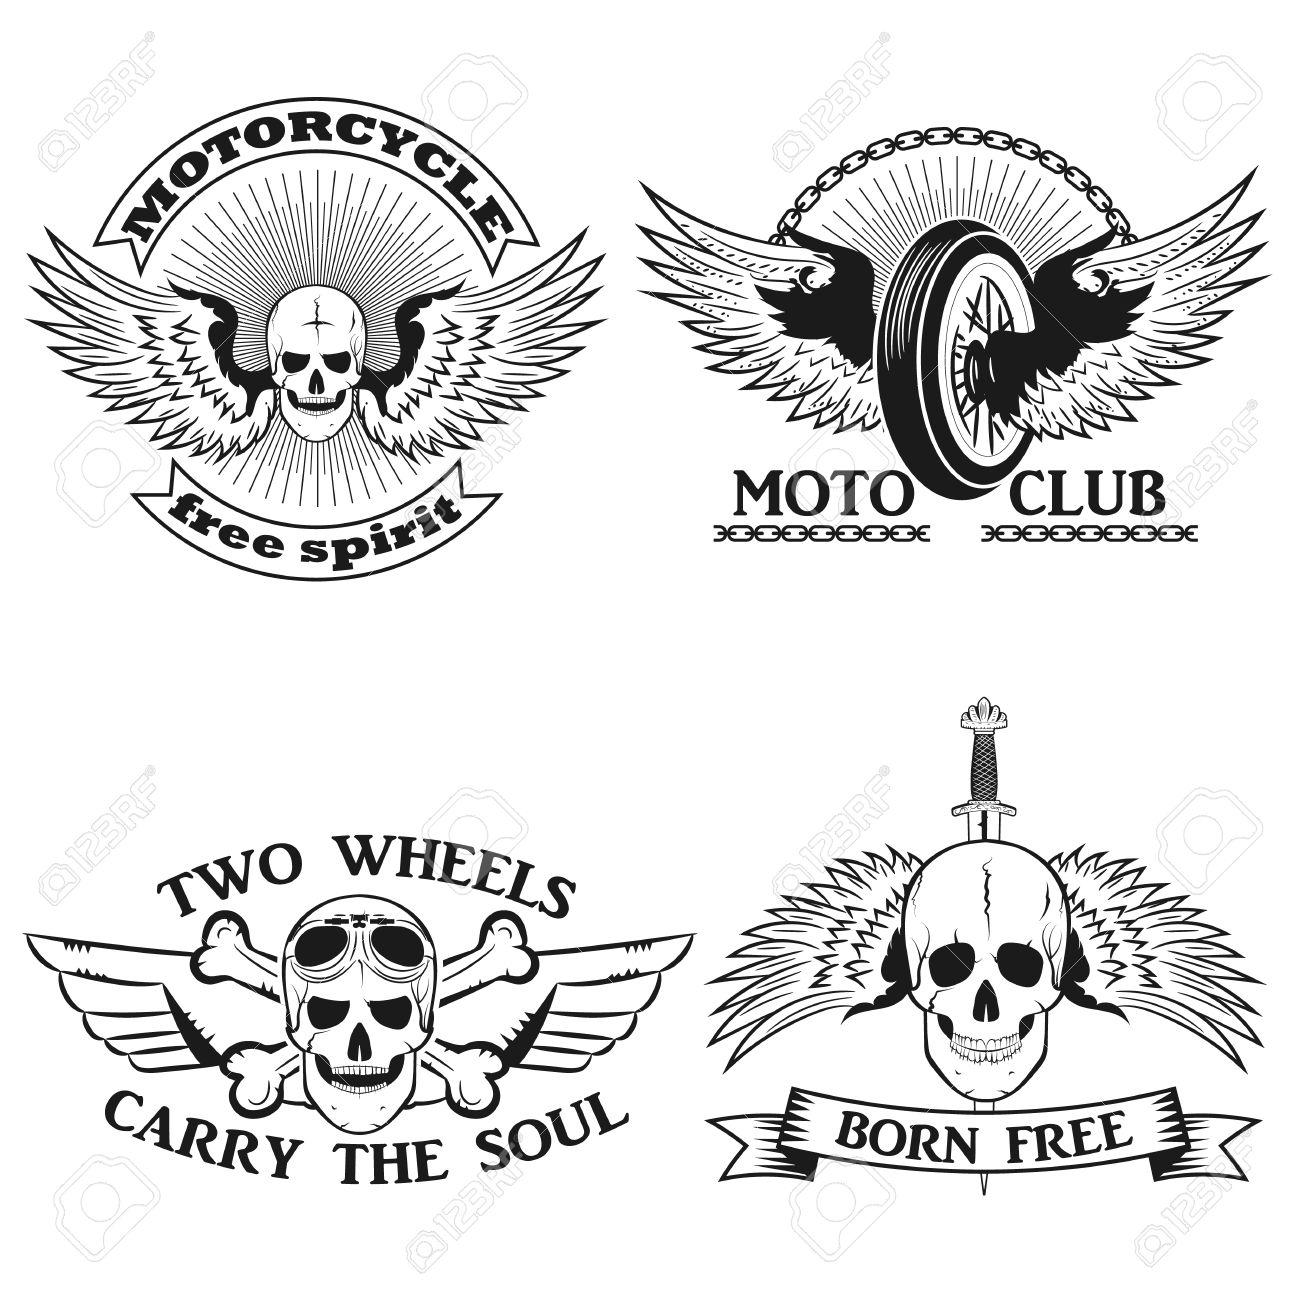 Moto logo biker stripe skull with wings motorcycle wheel skull and bones biker